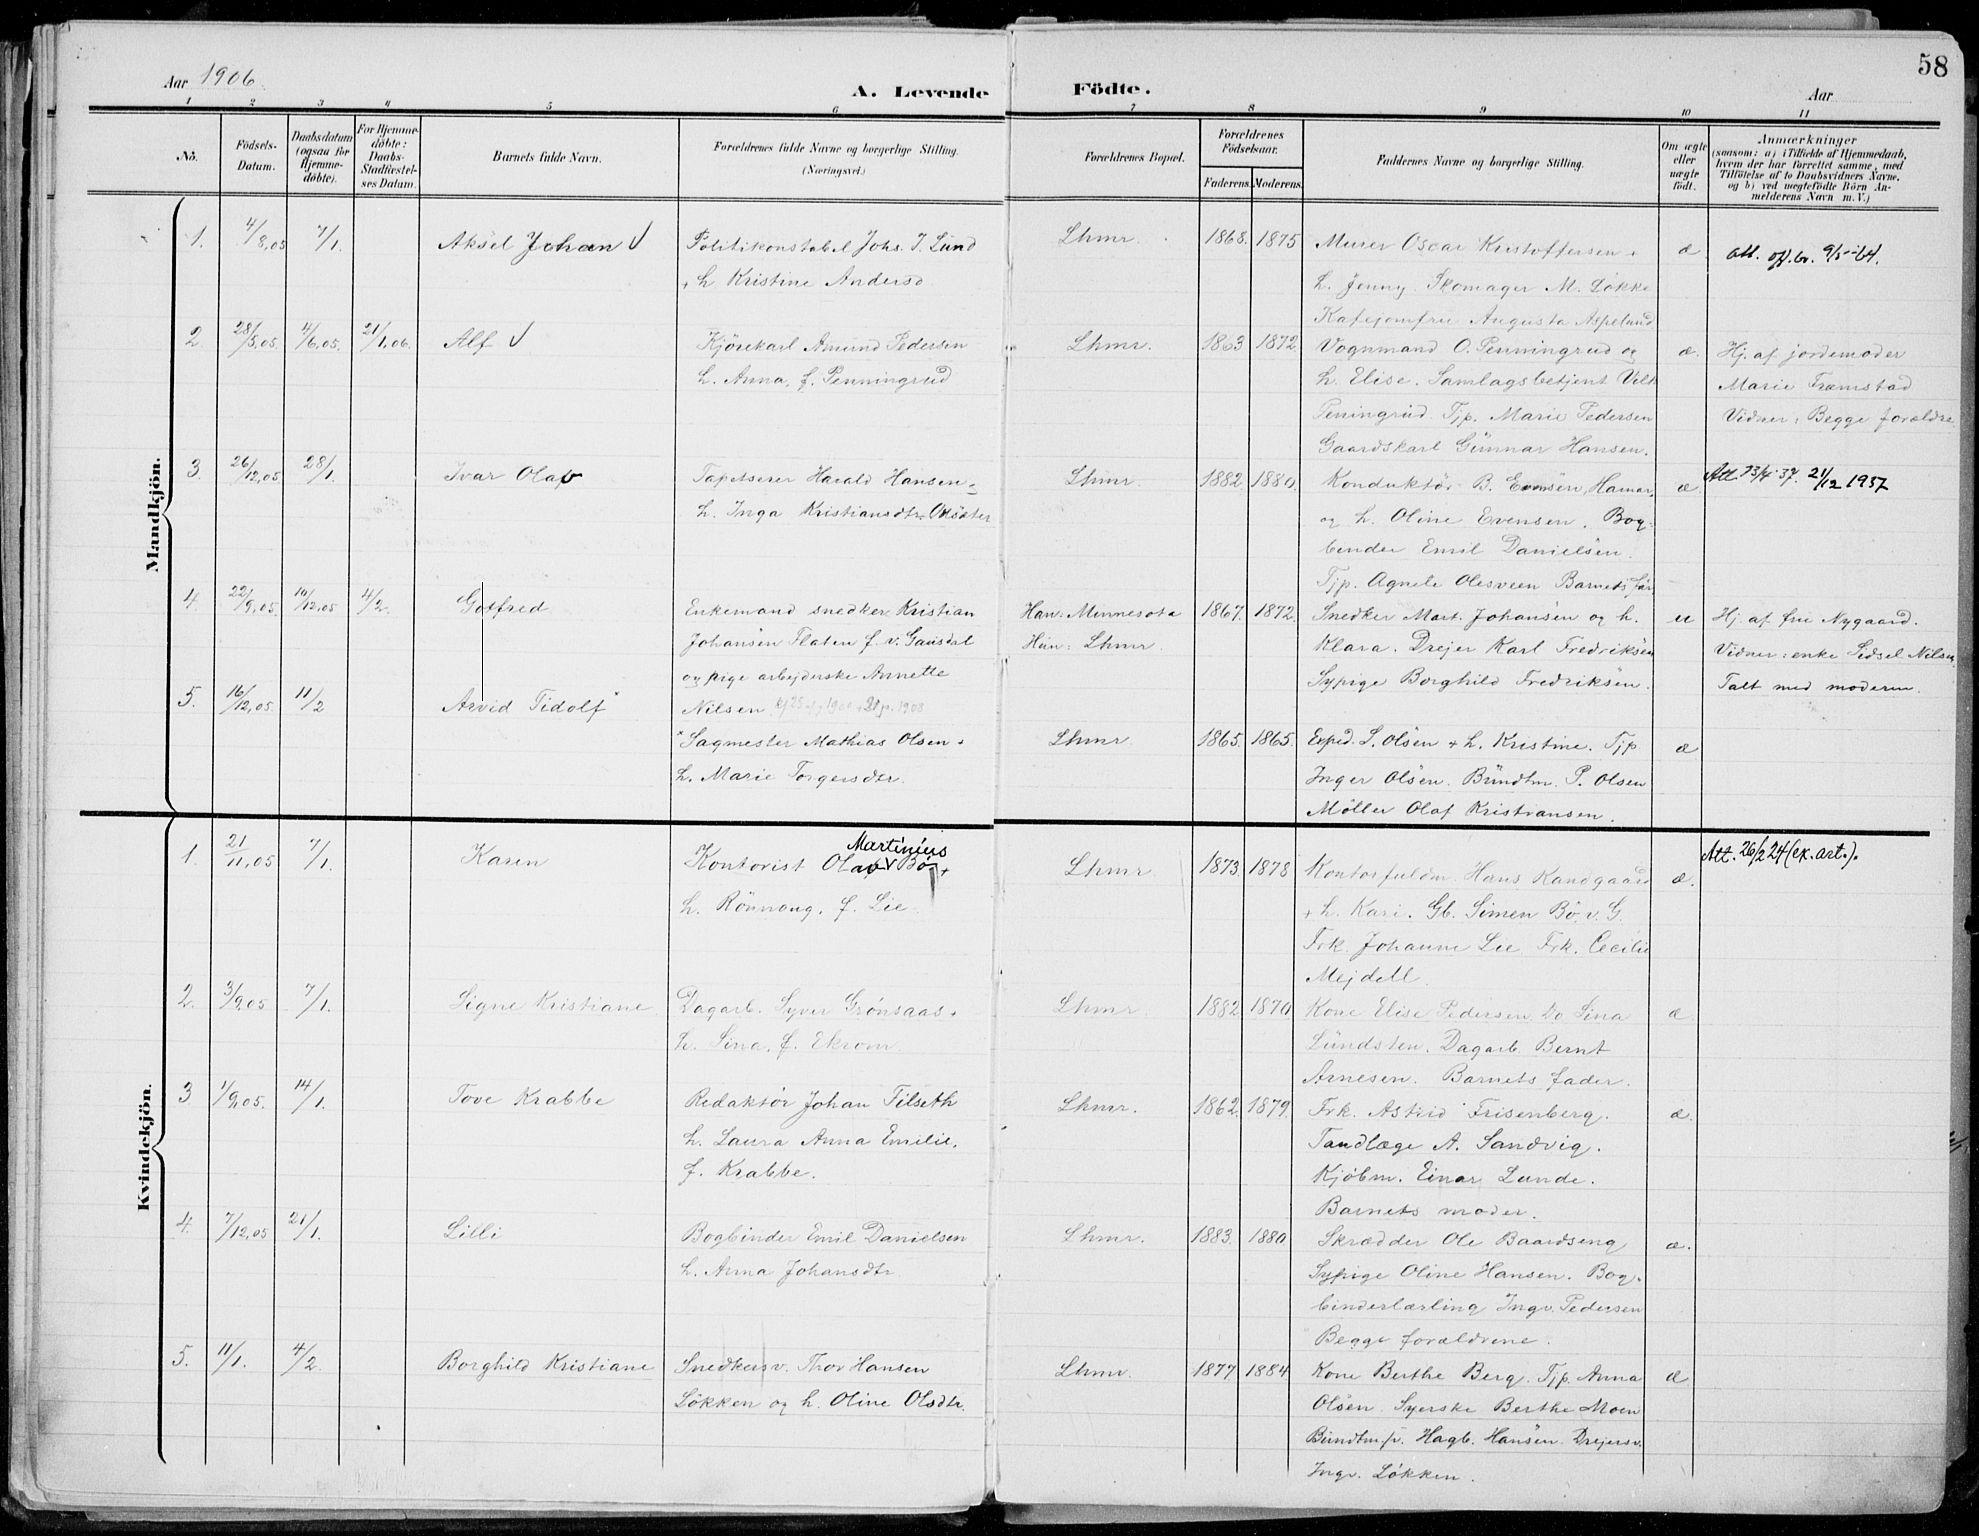 SAH, Lillehammer prestekontor, Ministerialbok nr. 1, 1901-1916, s. 58